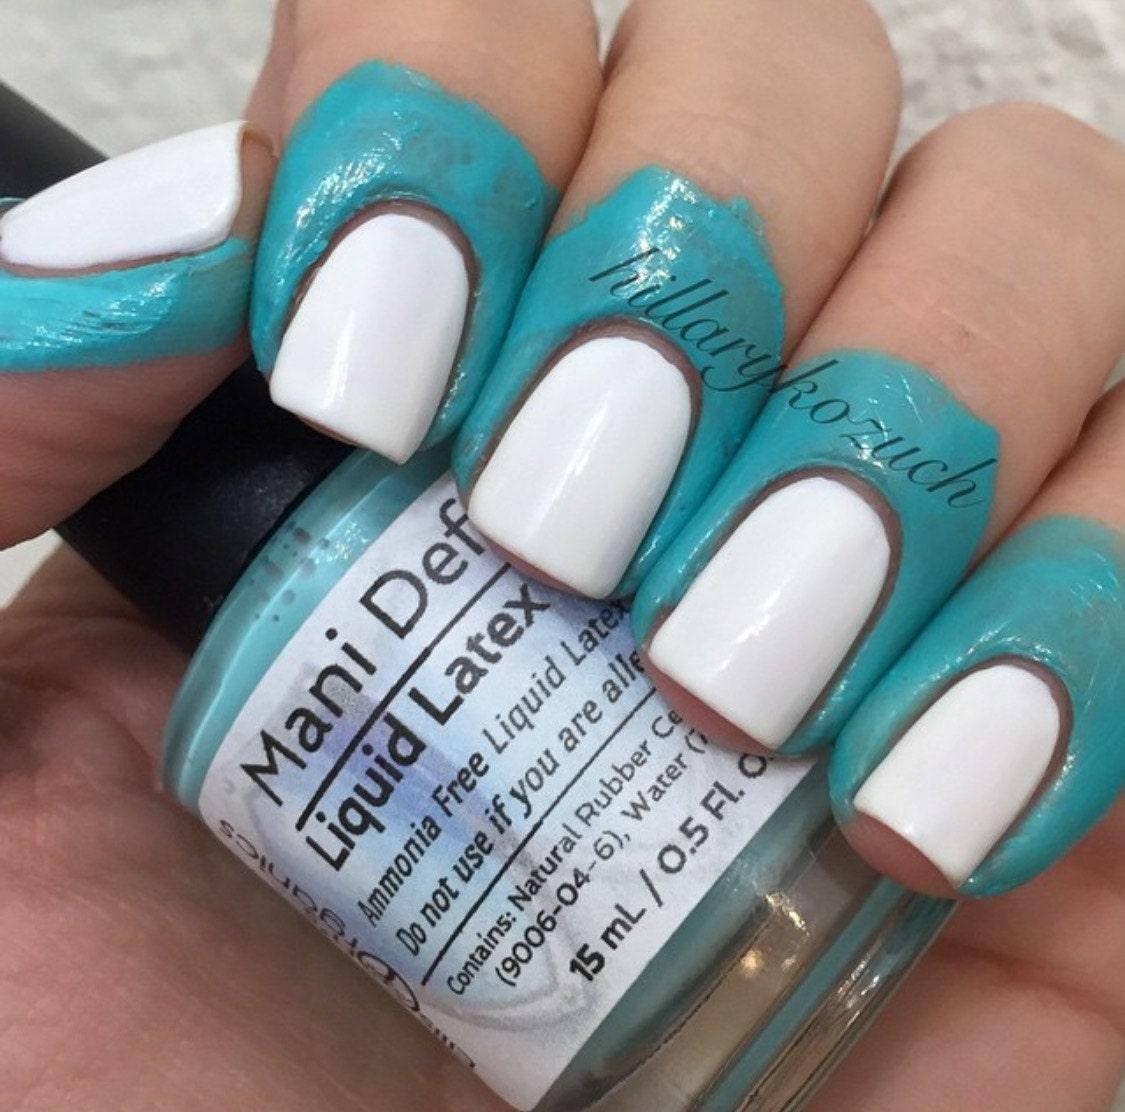 Best Nail Polish For Stamping Nail Art Hireability